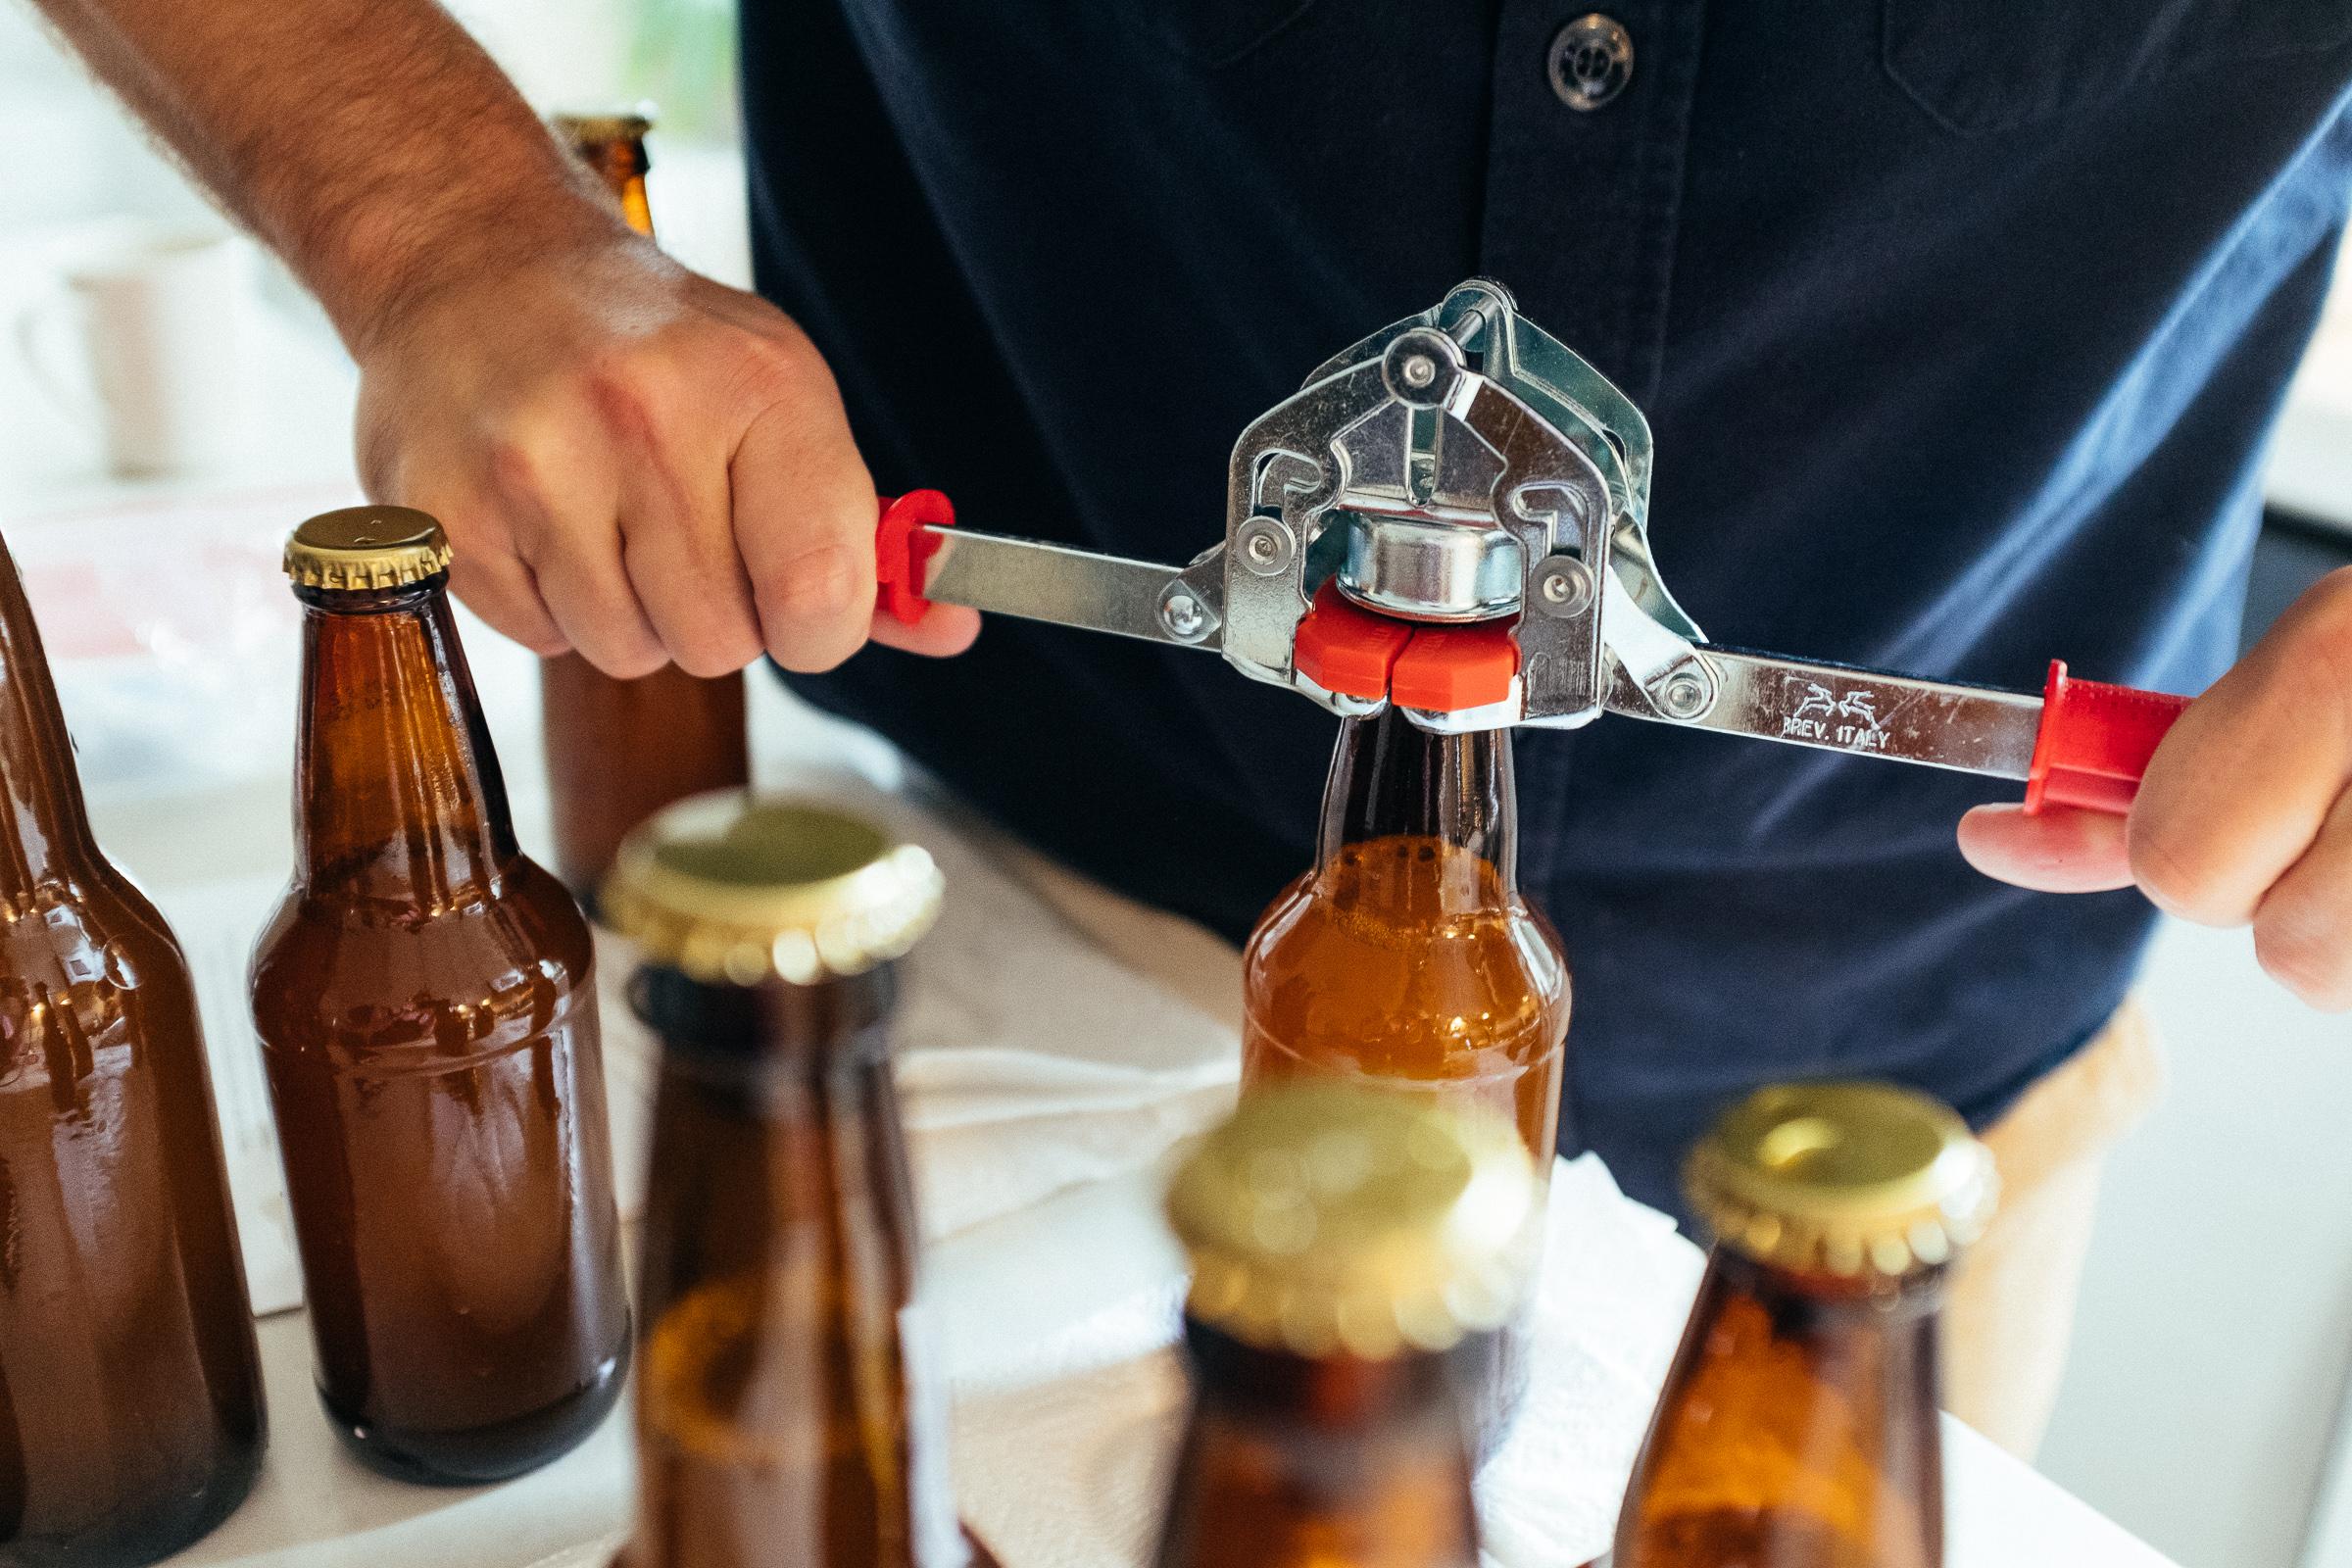 make-small-apartment-beer-7738.jpg